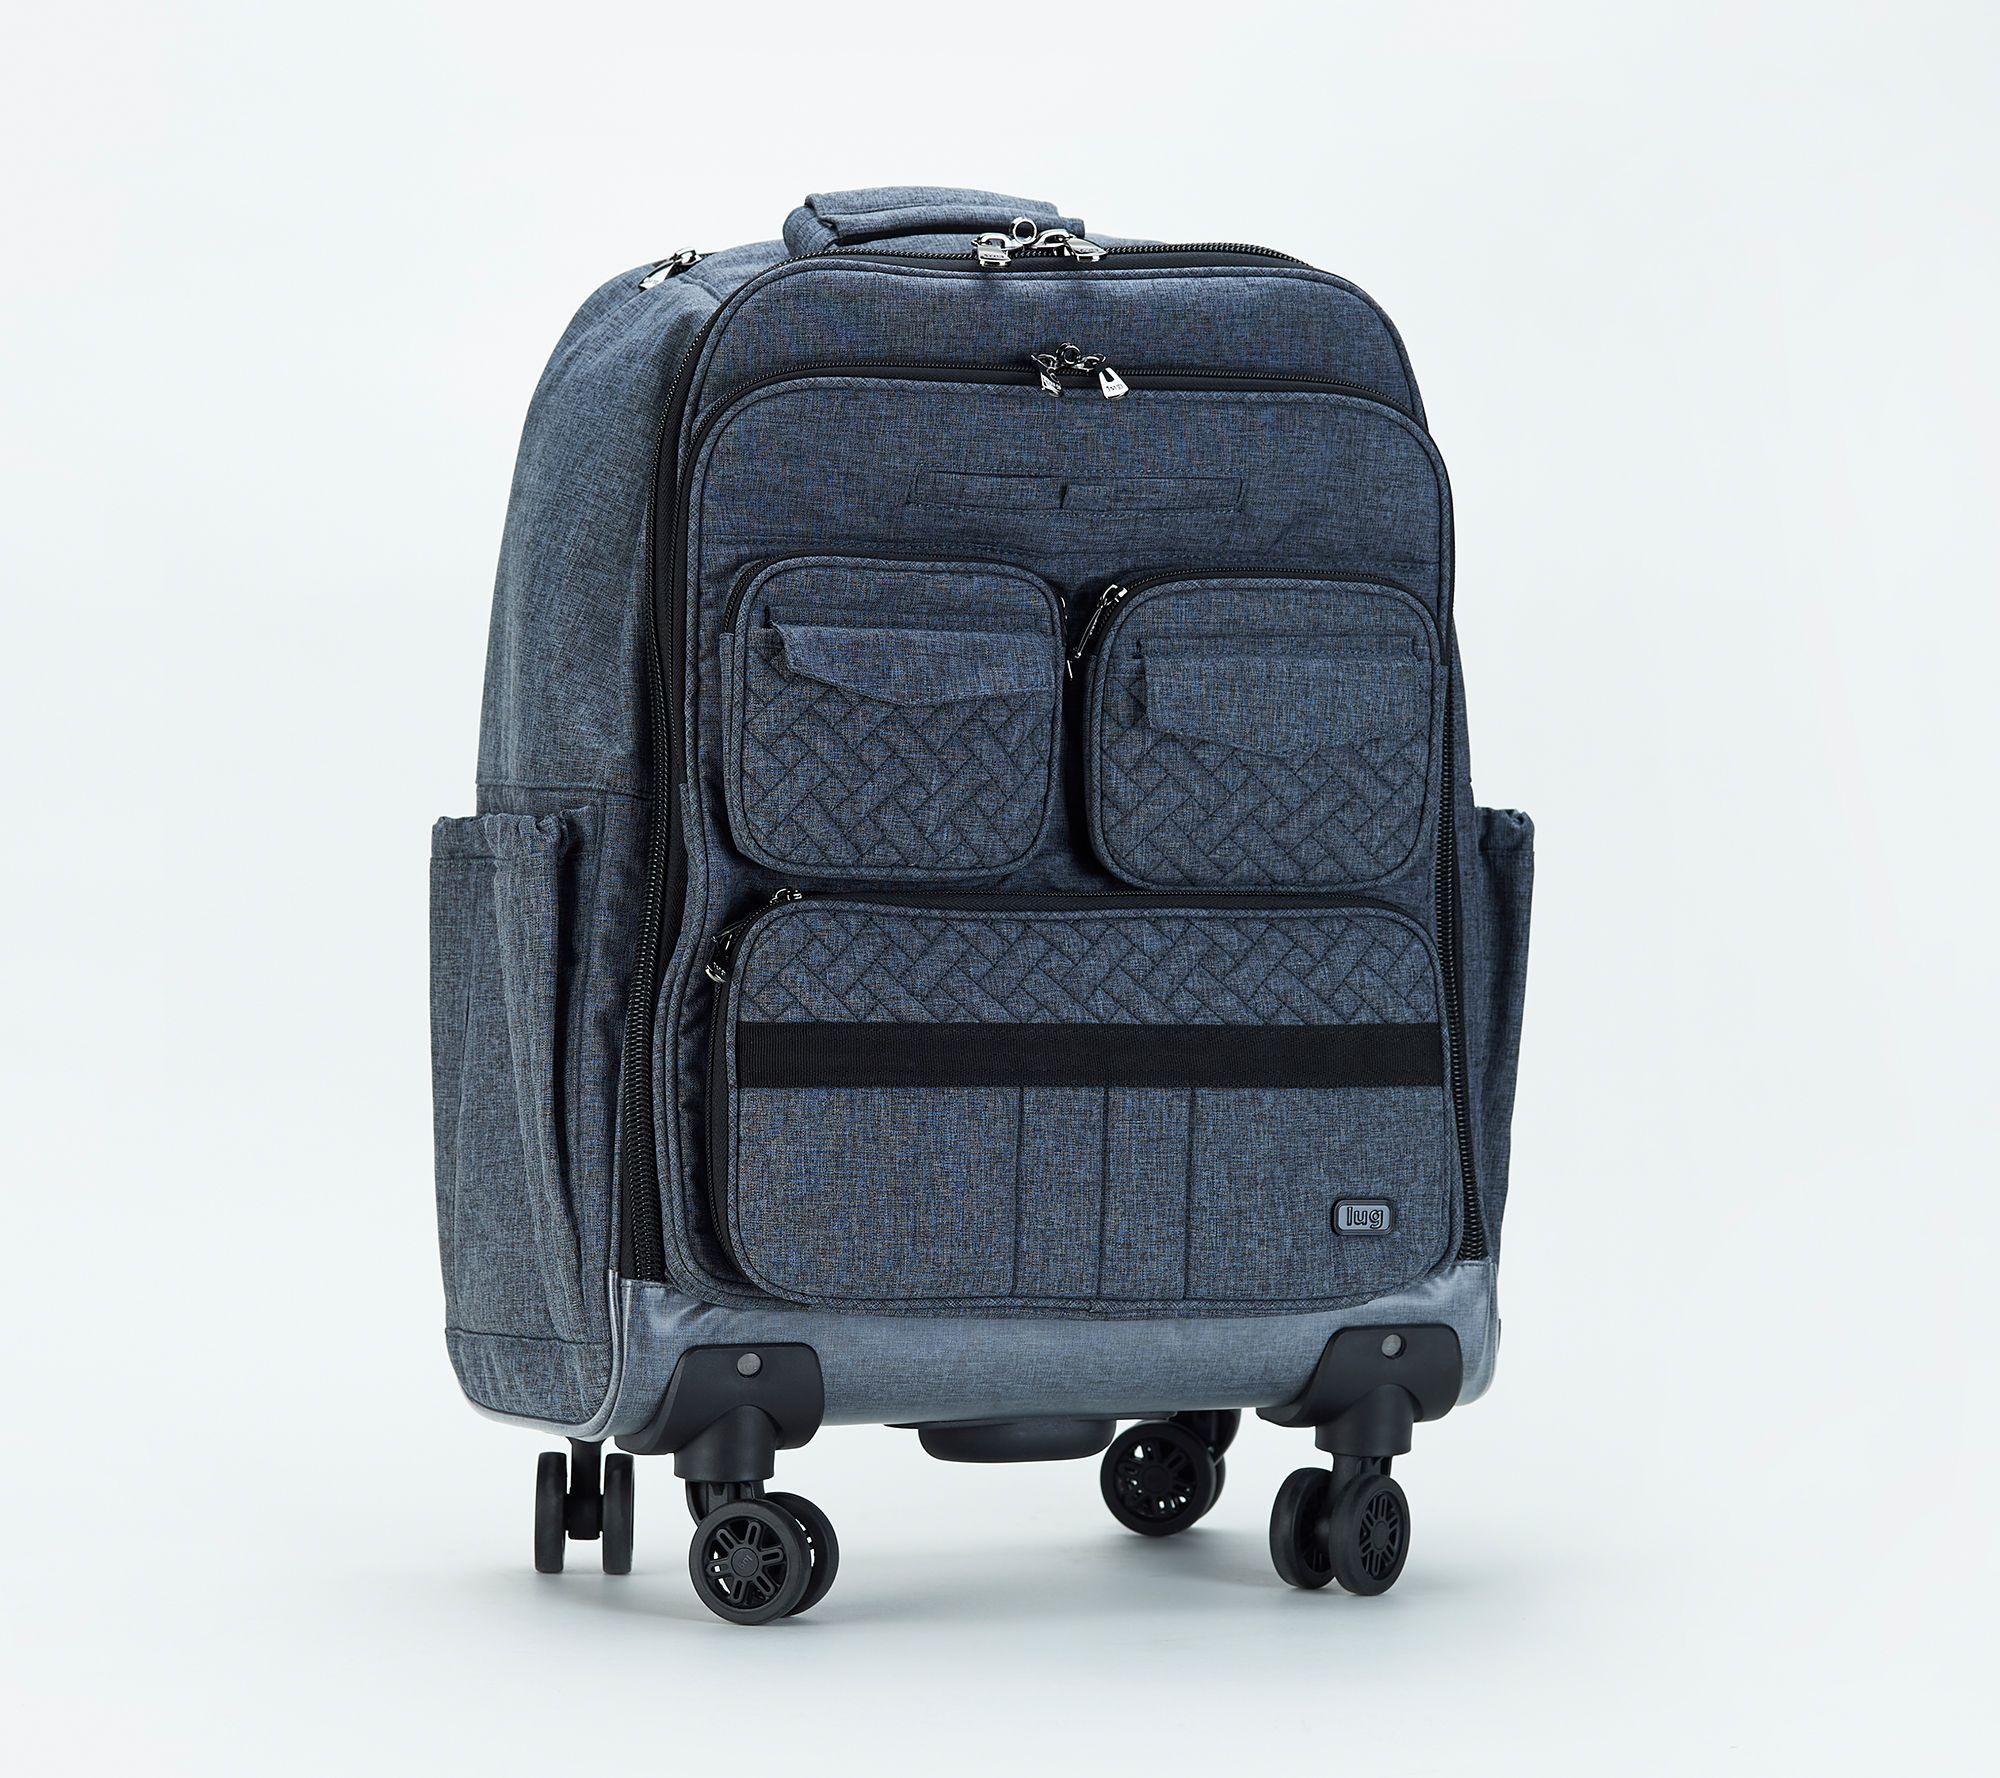 Groovy Lug Travel Roller Bag Puddle Jumper Wheelie 2 Qvc Com Home Interior And Landscaping Ologienasavecom